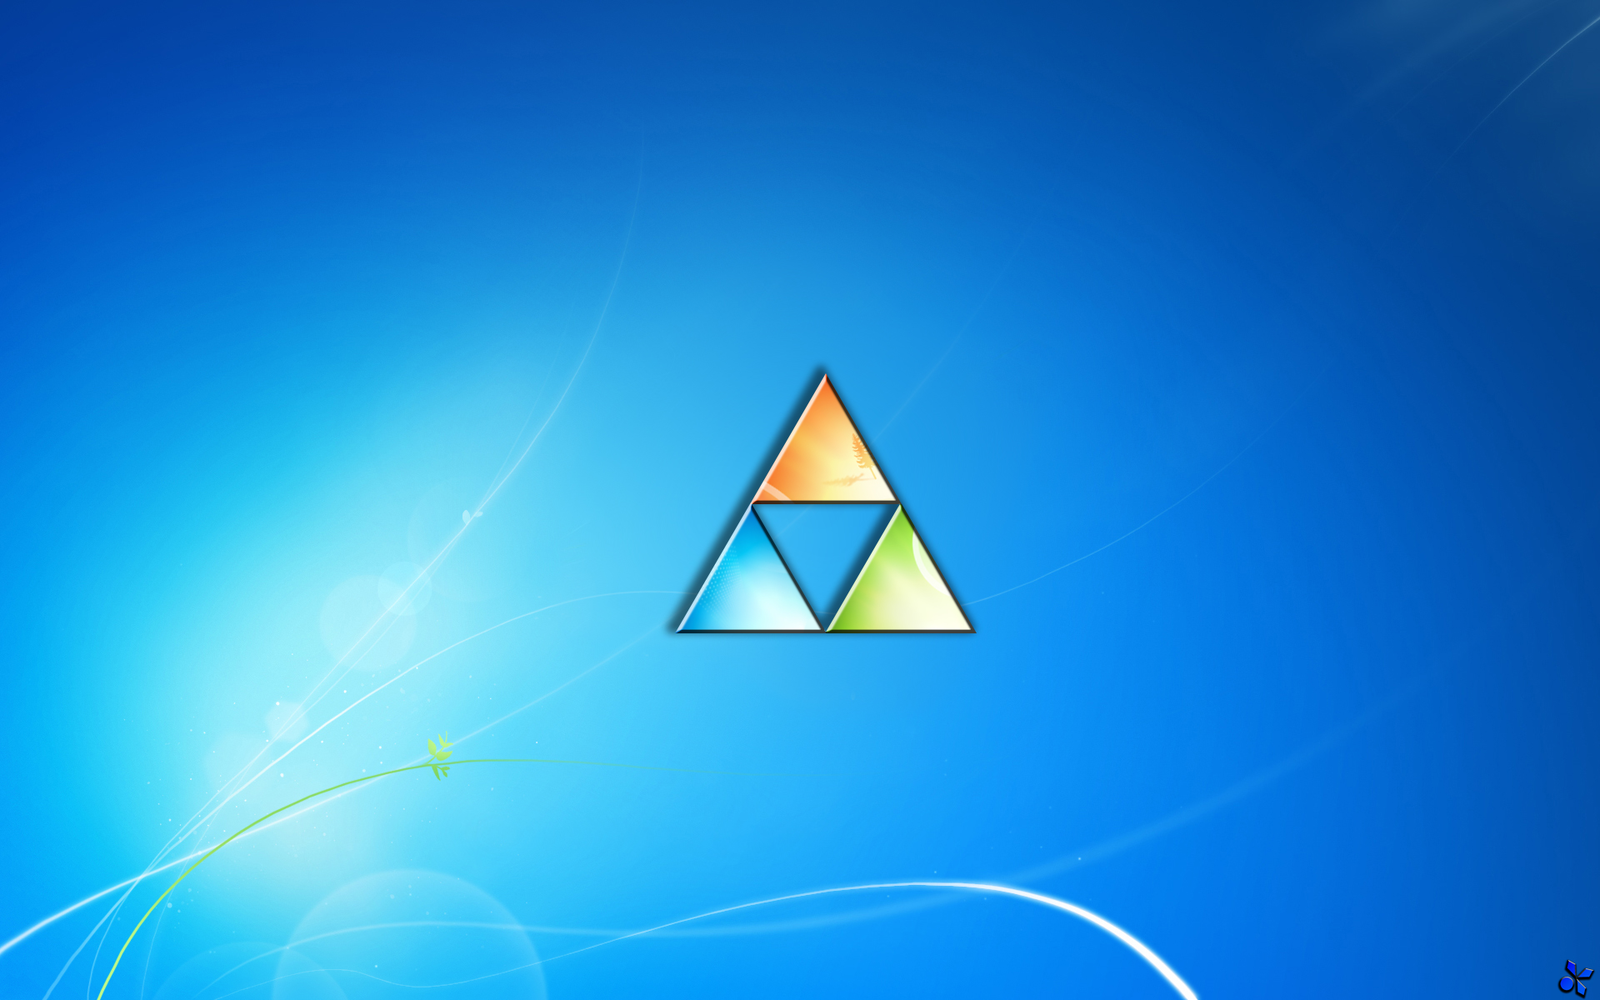 Legend of Zelda Triforce Windows 7 wallpaper by DigitalVoyager on 1600x1000